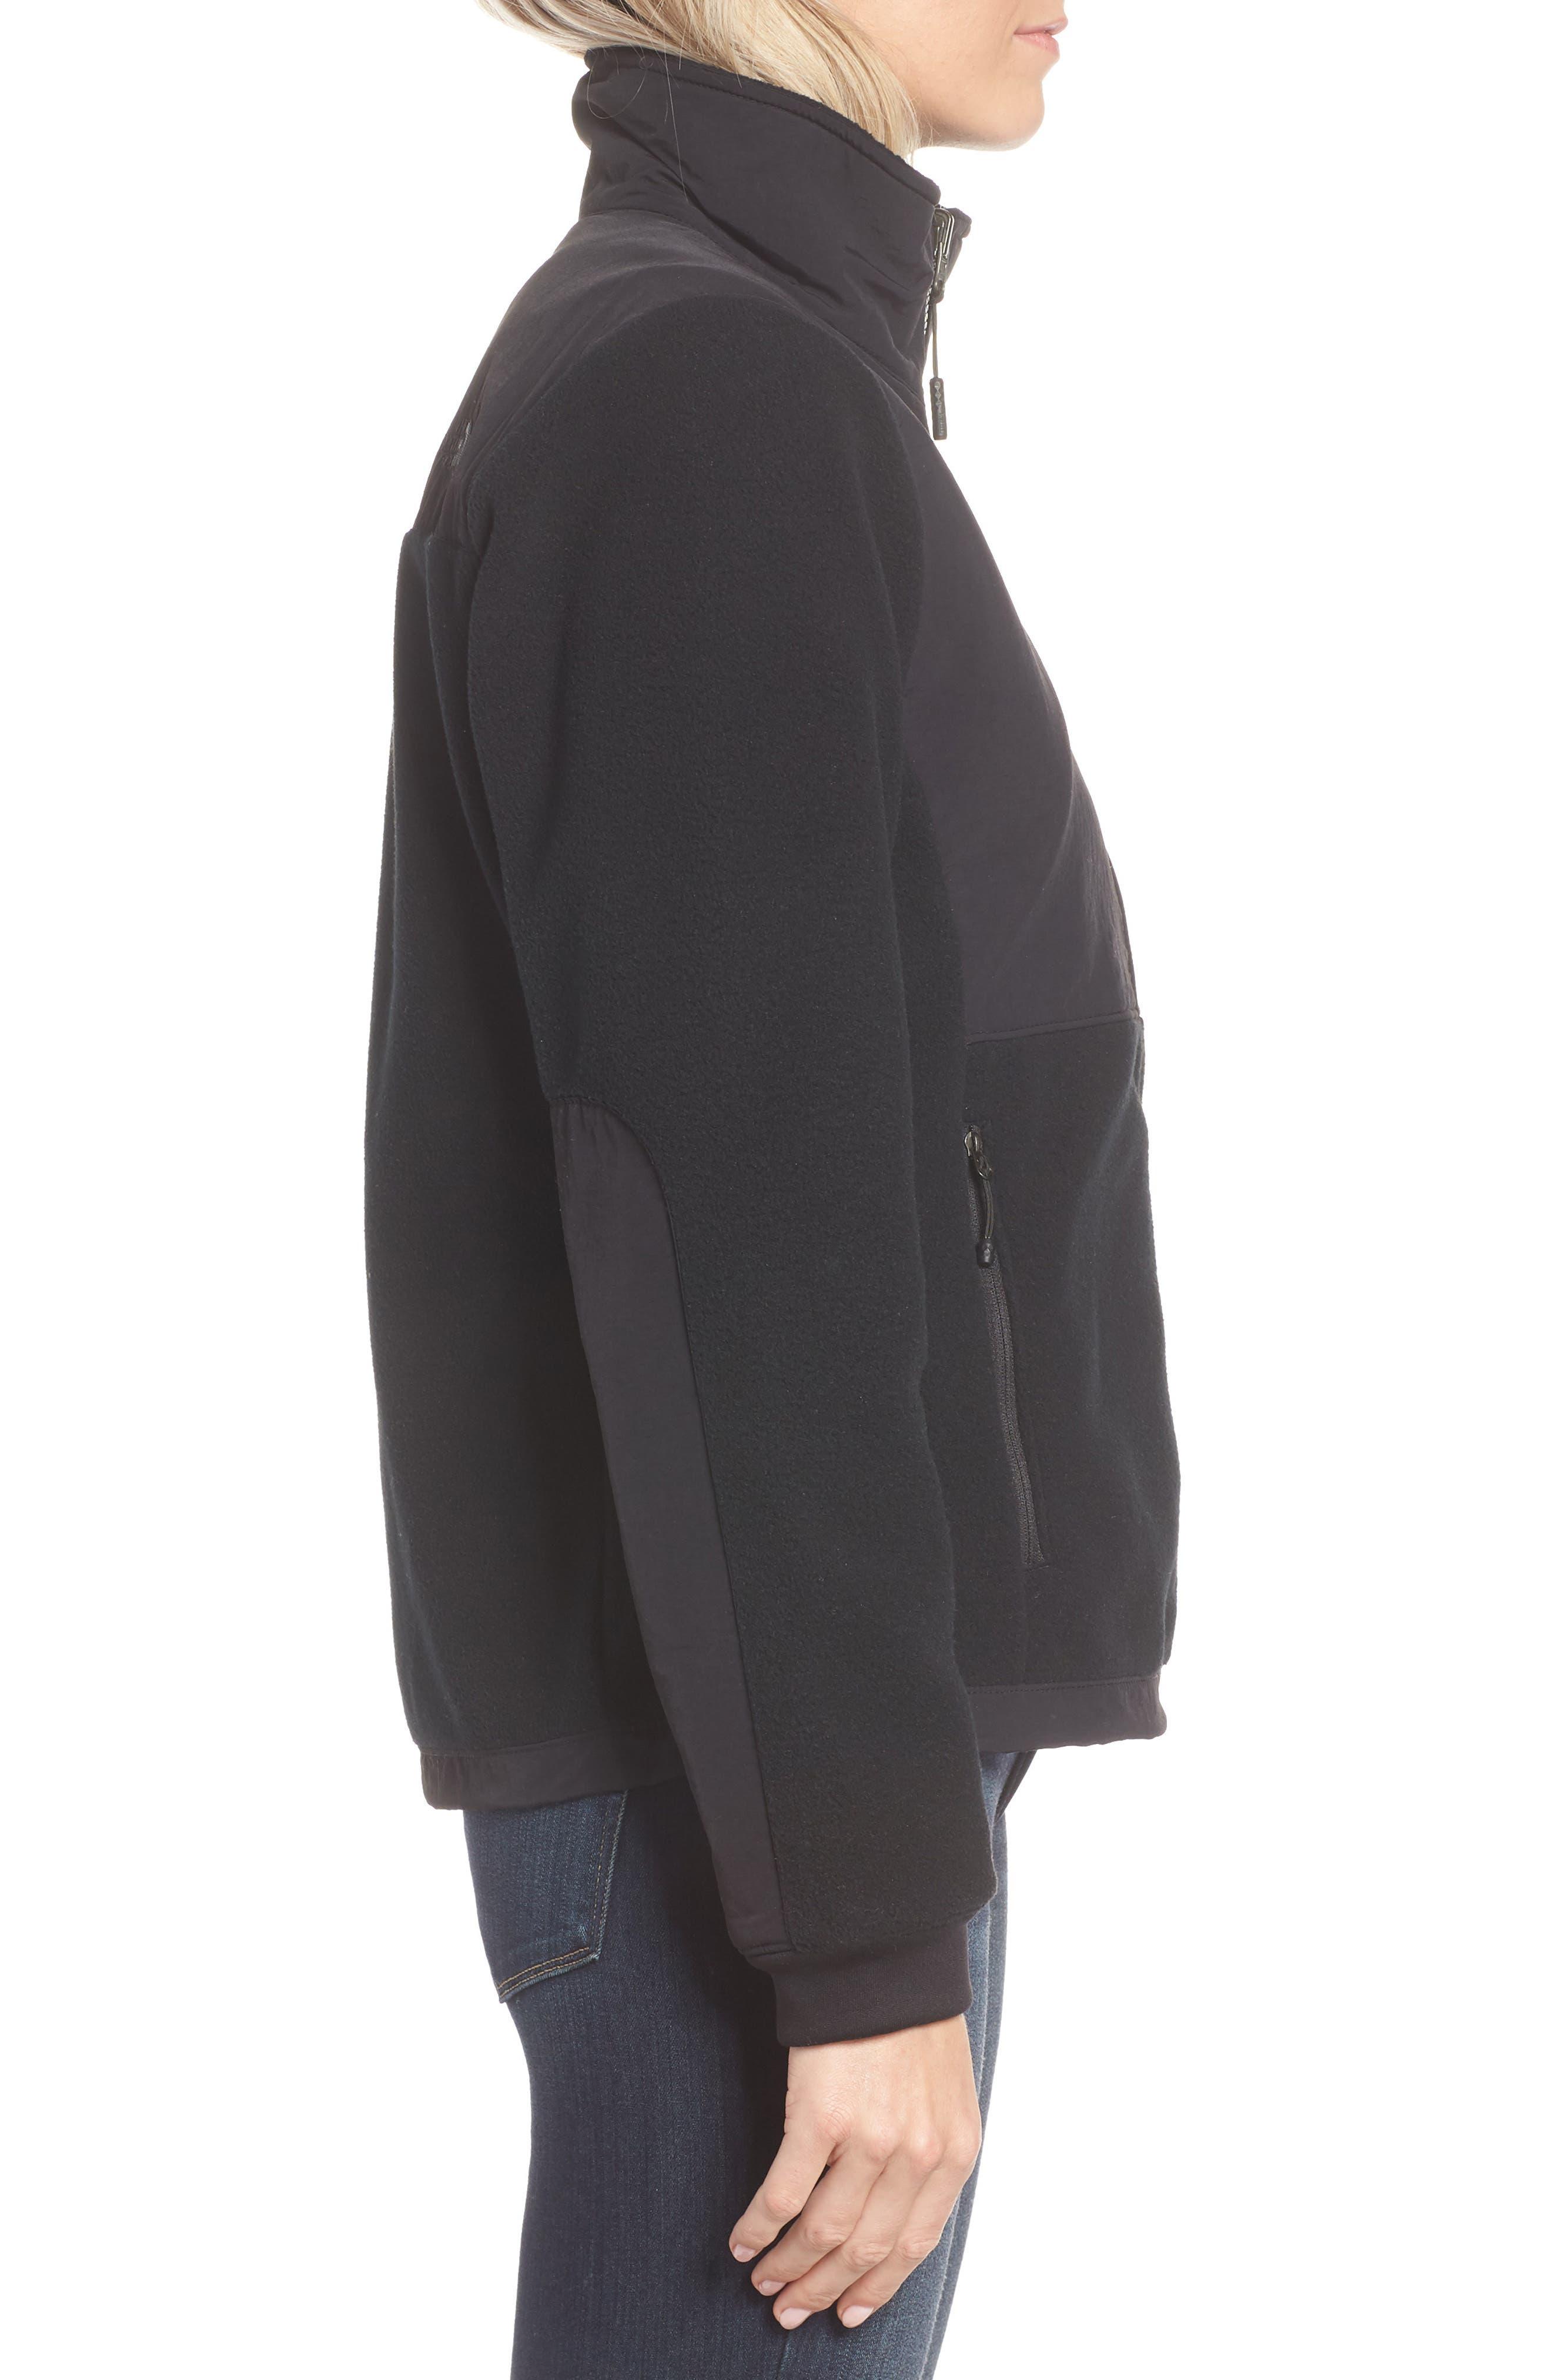 THE NORTH FACE, Denali 2 Jacket, Alternate thumbnail 4, color, TNF BLACK